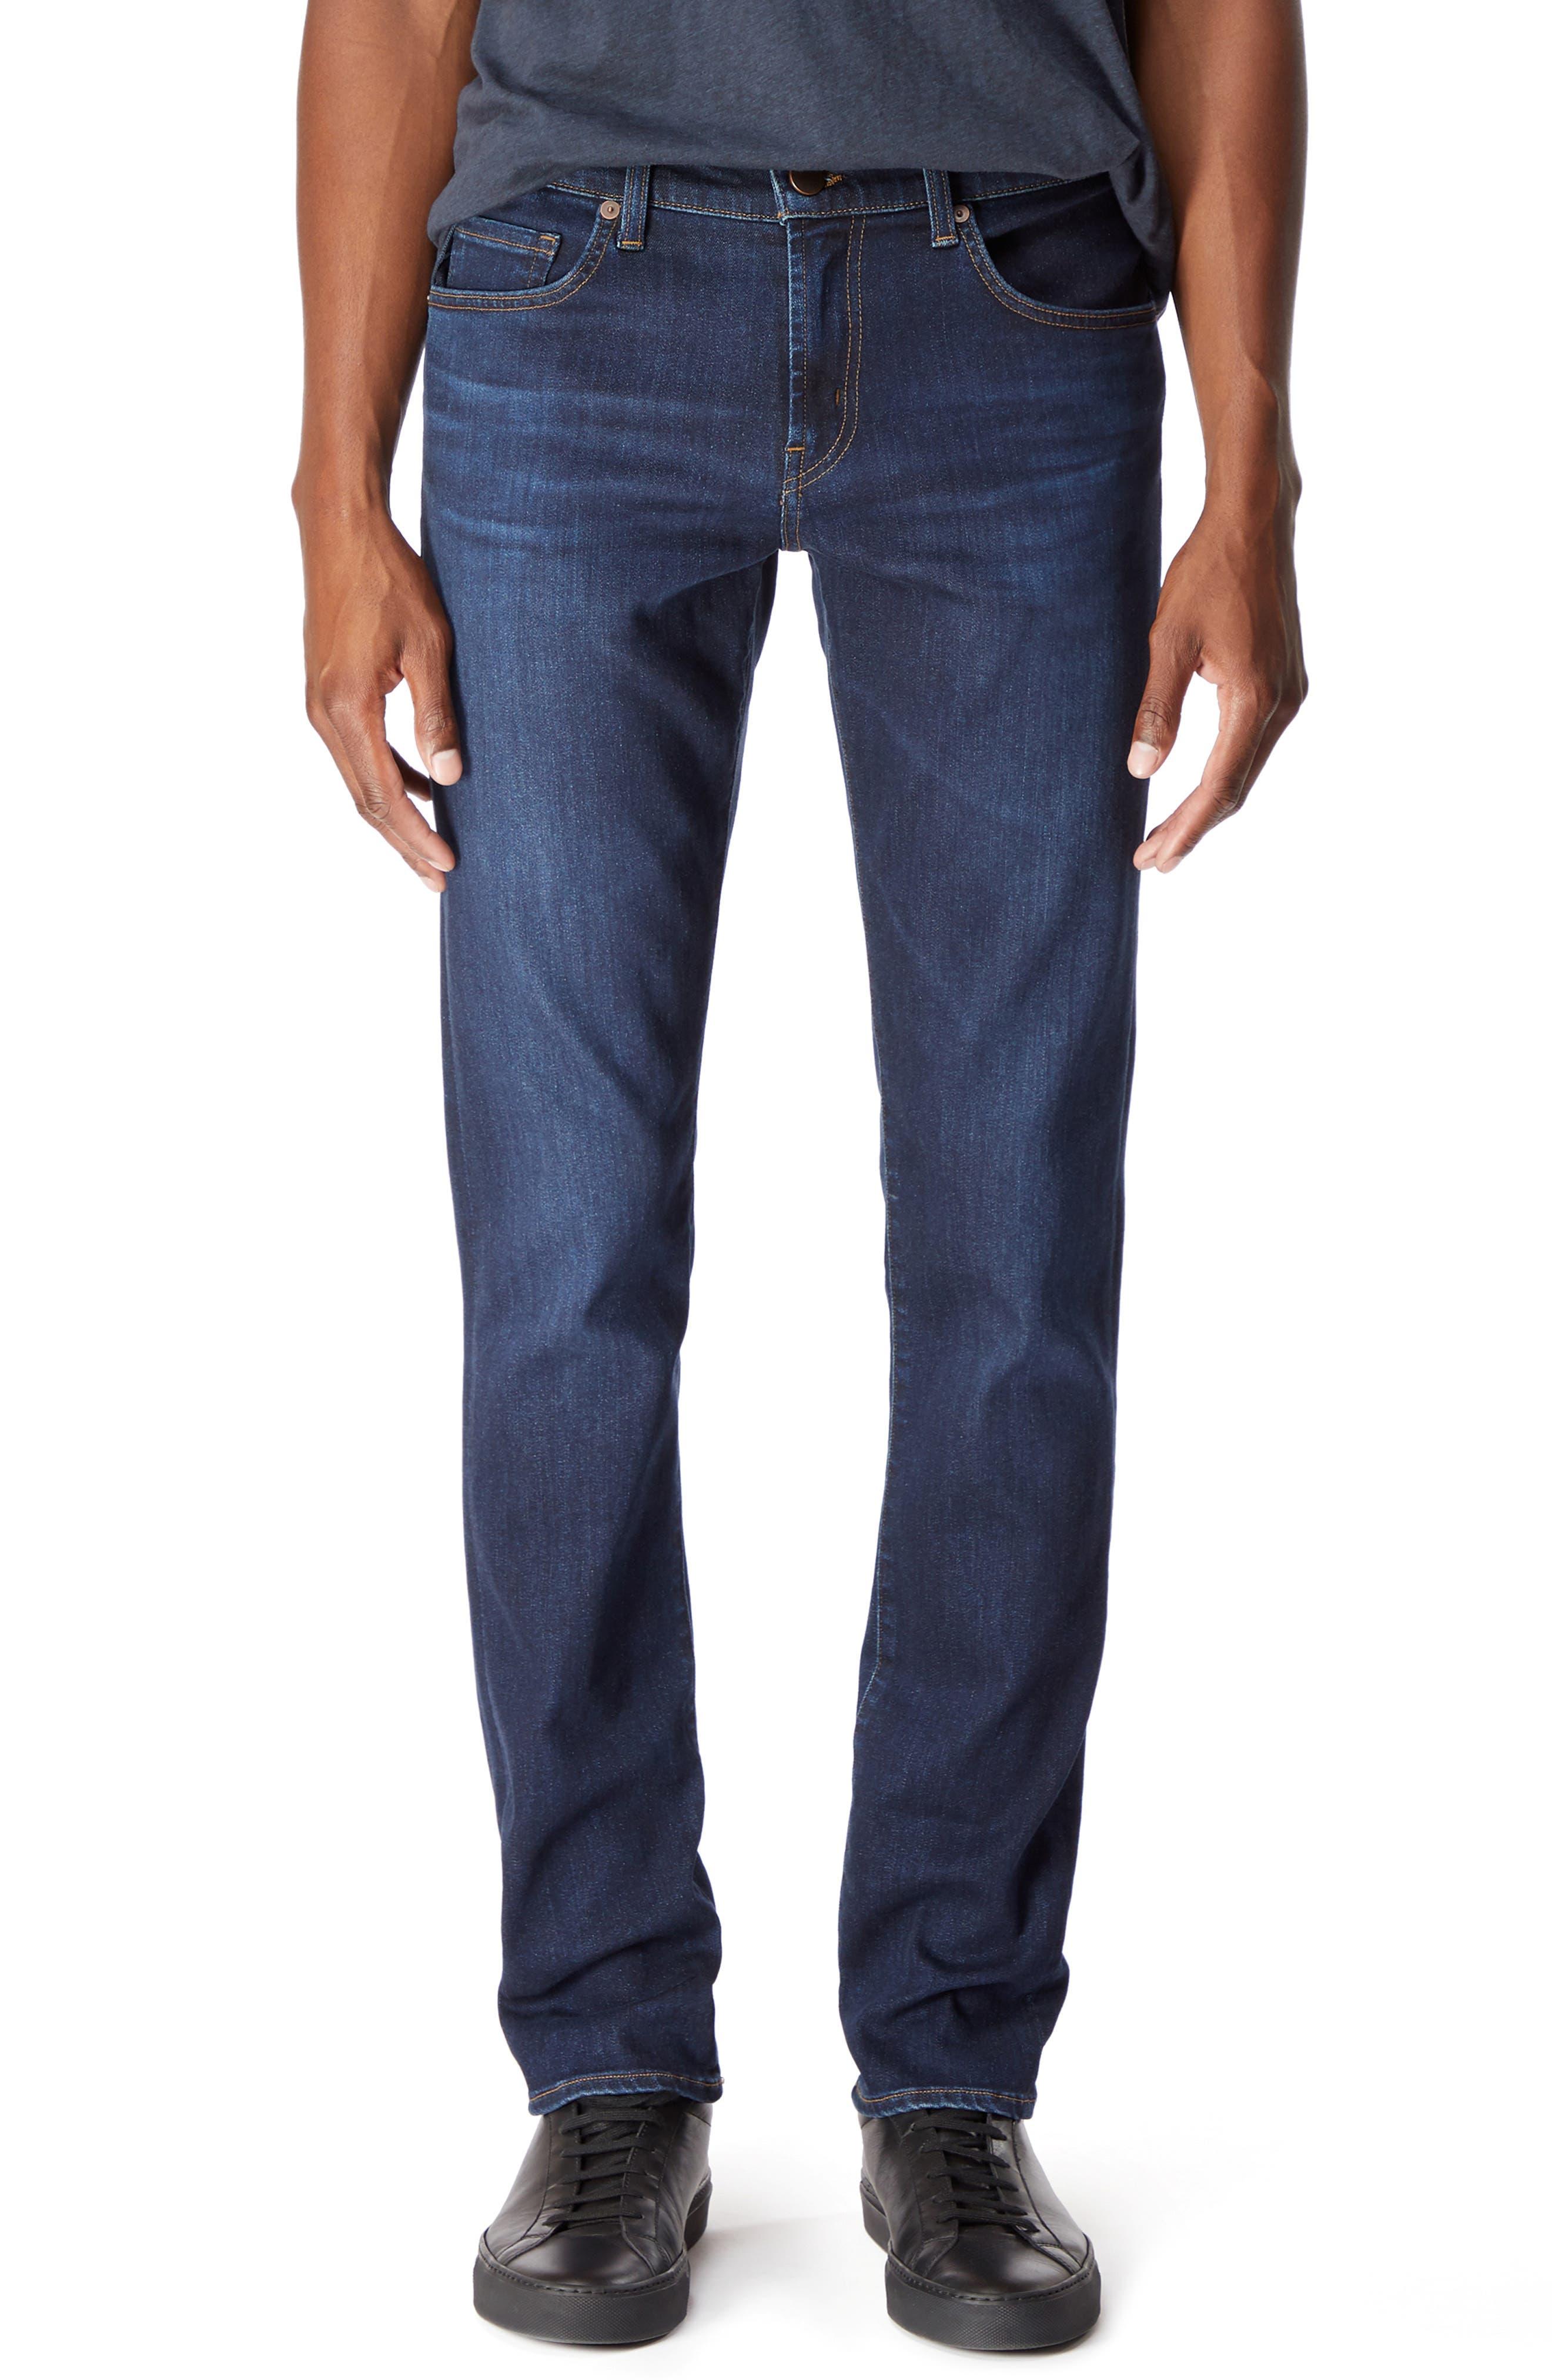 Kane Slim Straight Leg Jeans,                             Main thumbnail 1, color,                             GLEETING